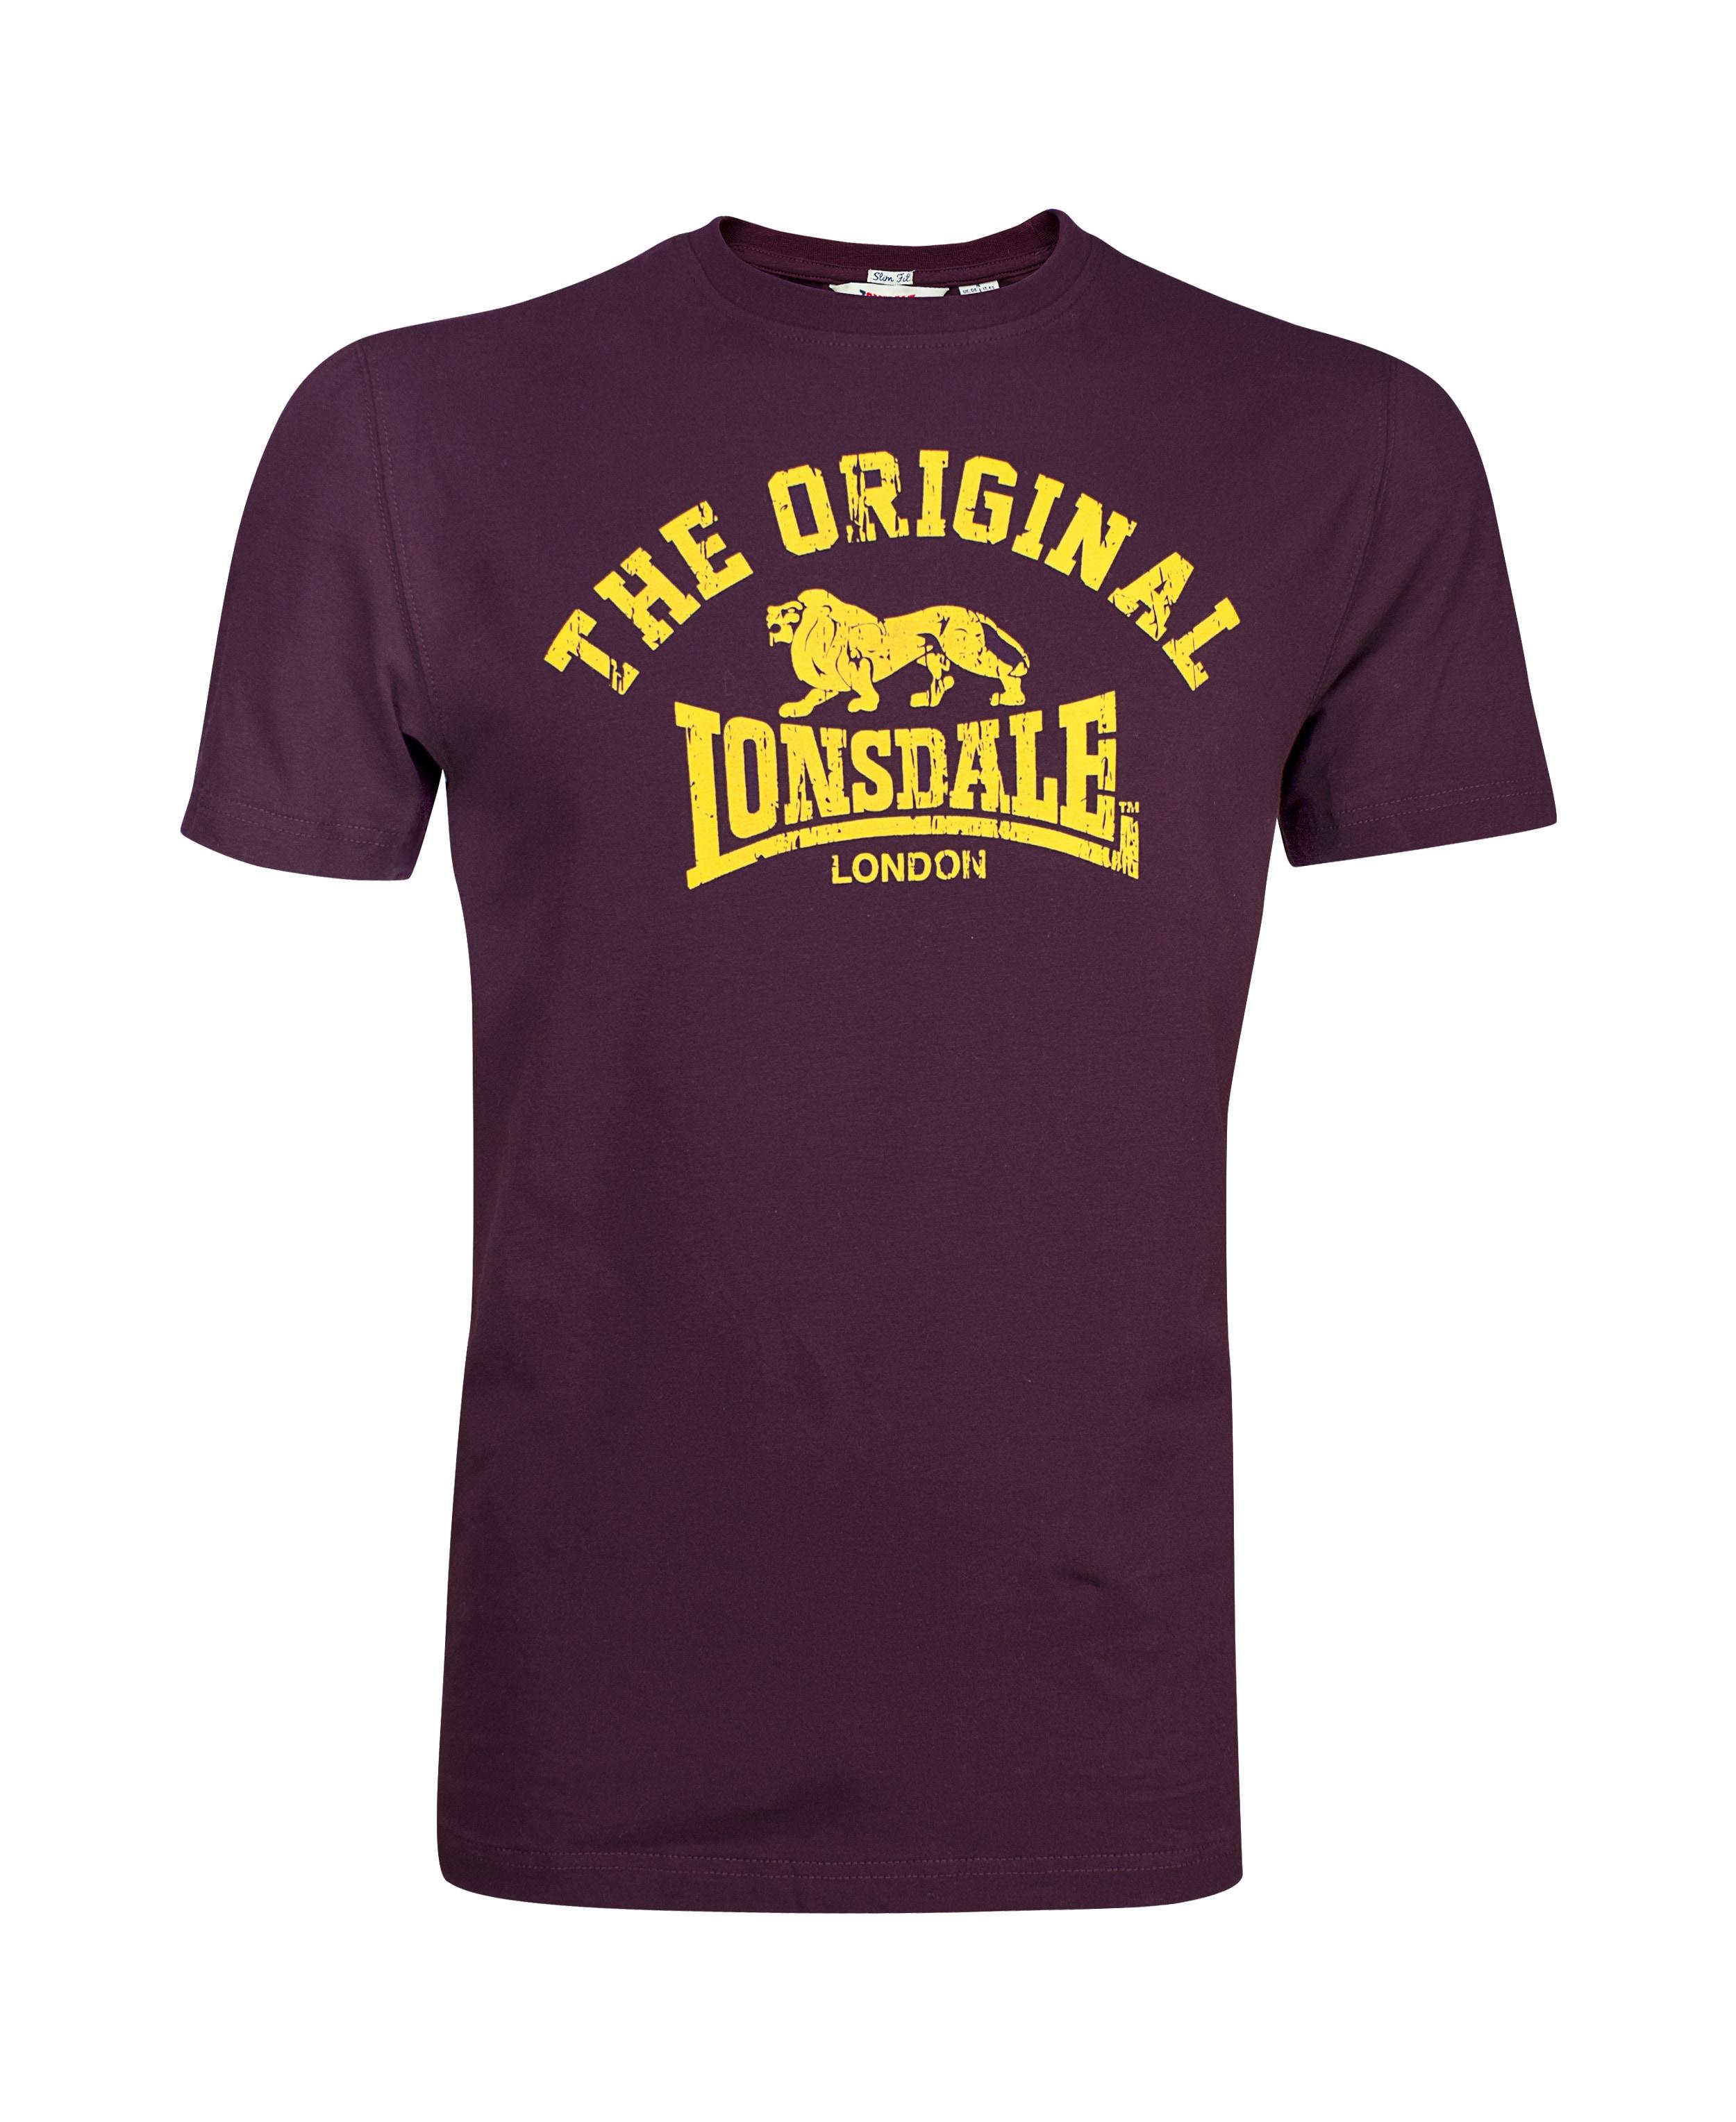 Lonsdale T-Shirt ORIGINAL | Bekleidung > Shirts > Sonstige Shirts | Lonsdale